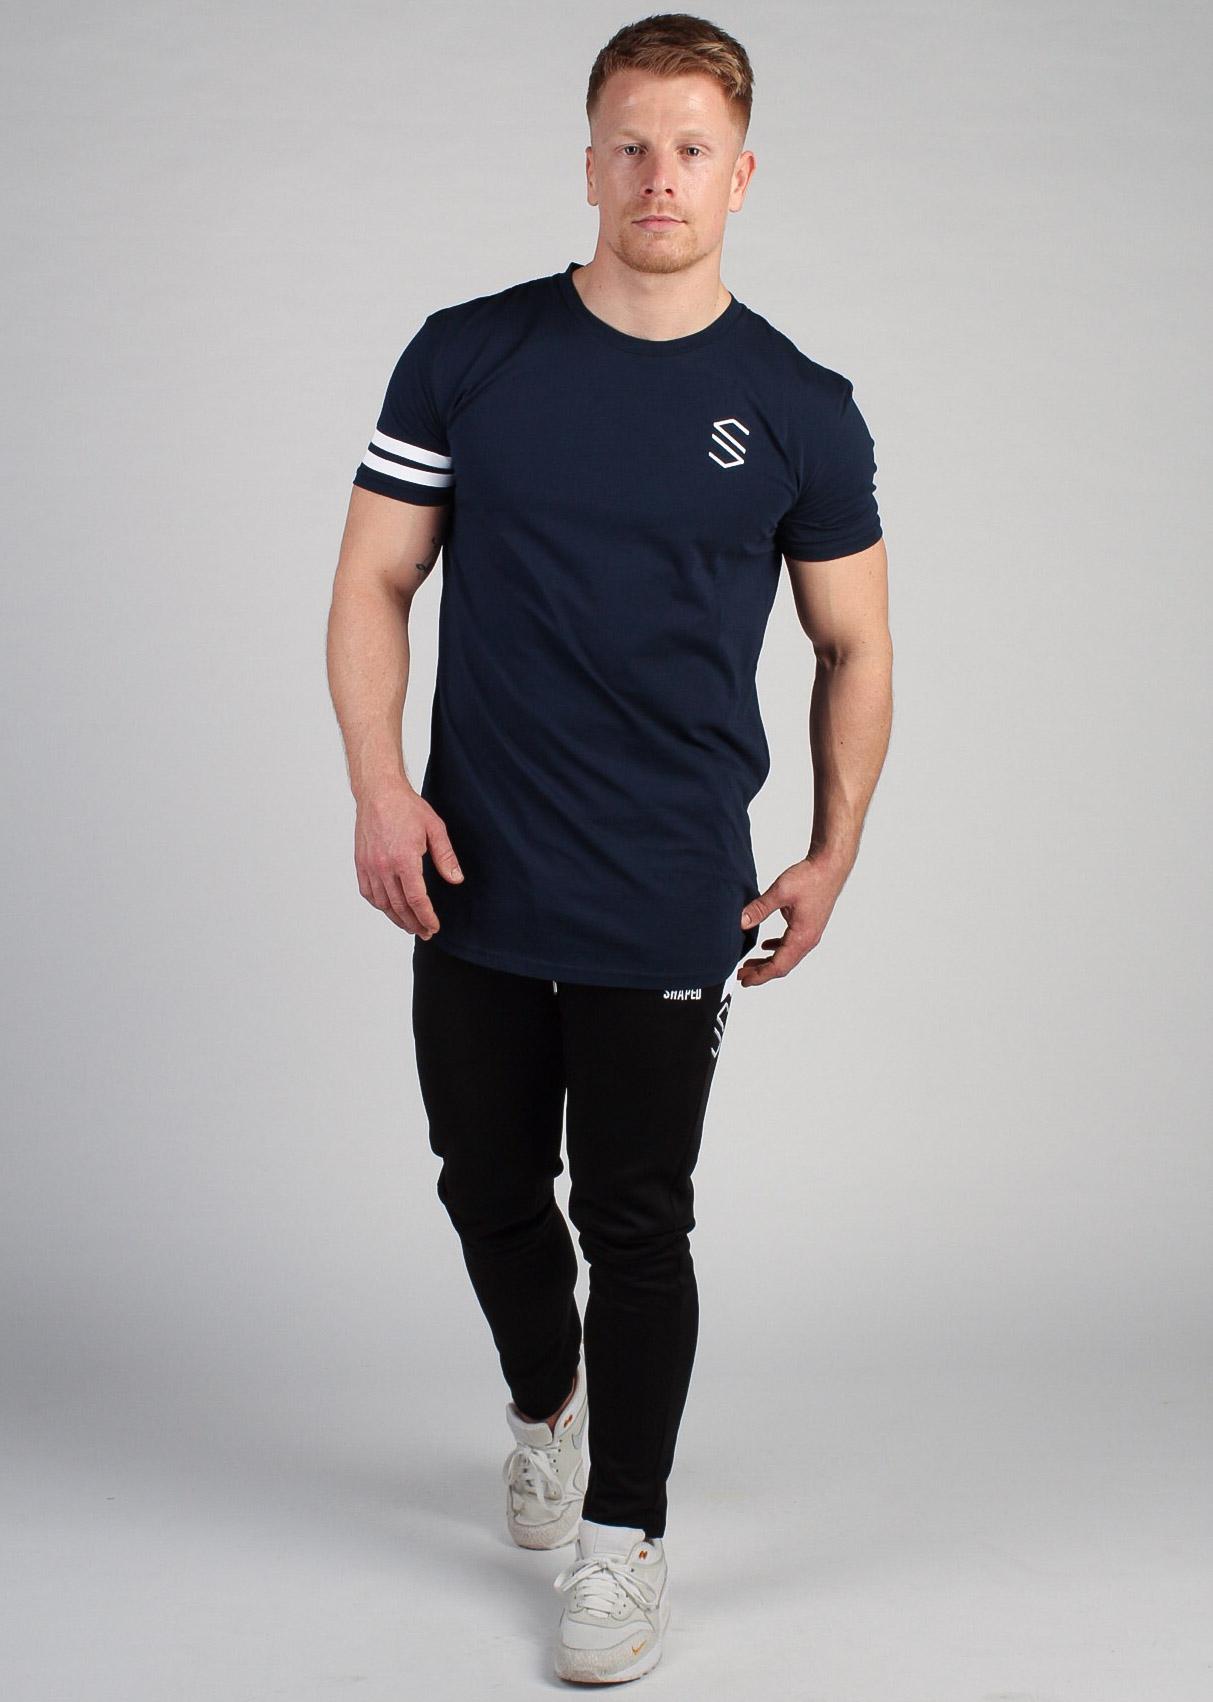 Shaped Striped T-shirt Navy